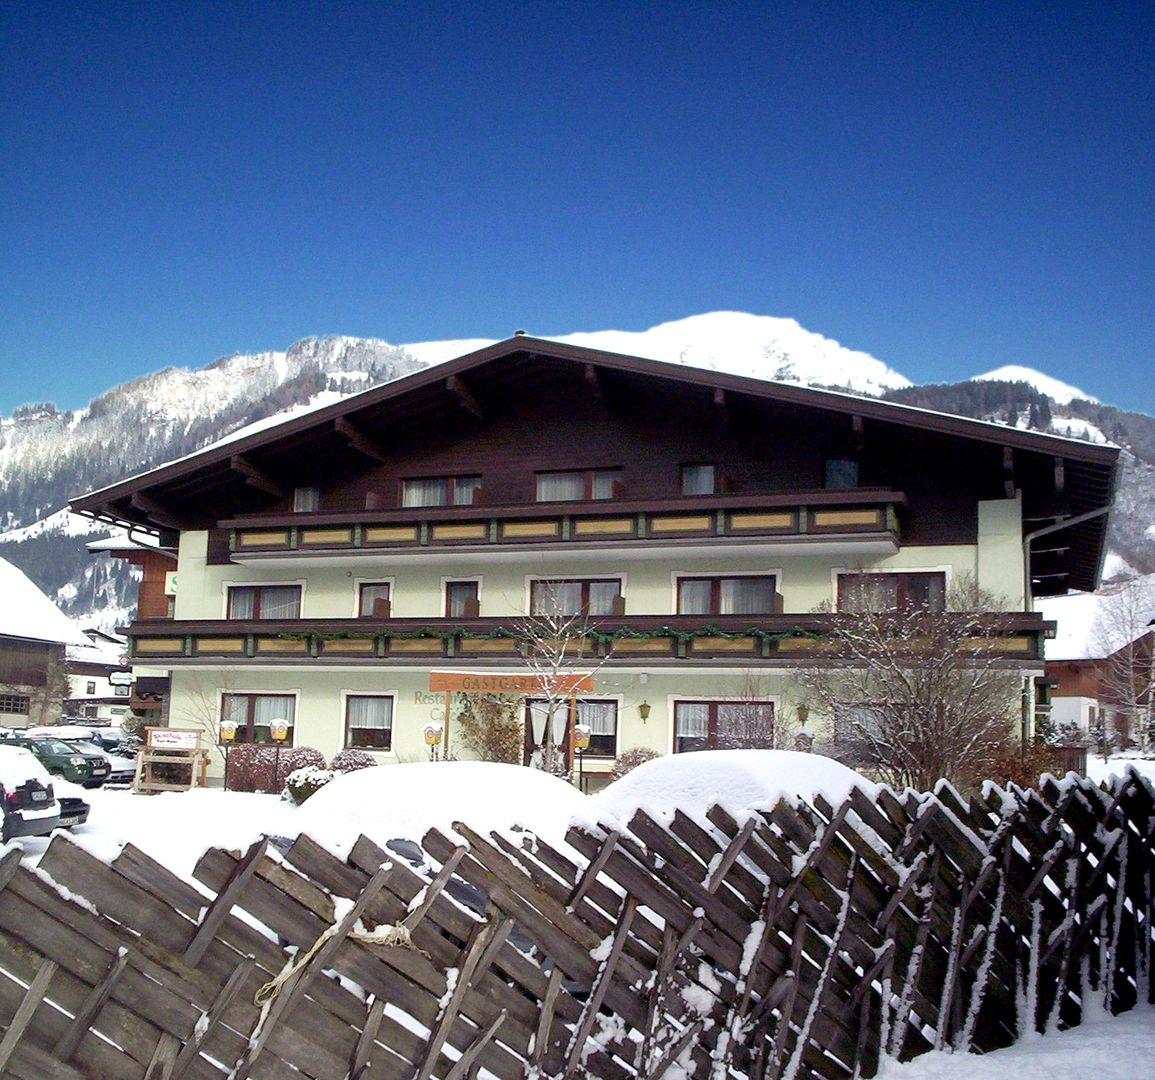 Slide1 - Salzburgerhof